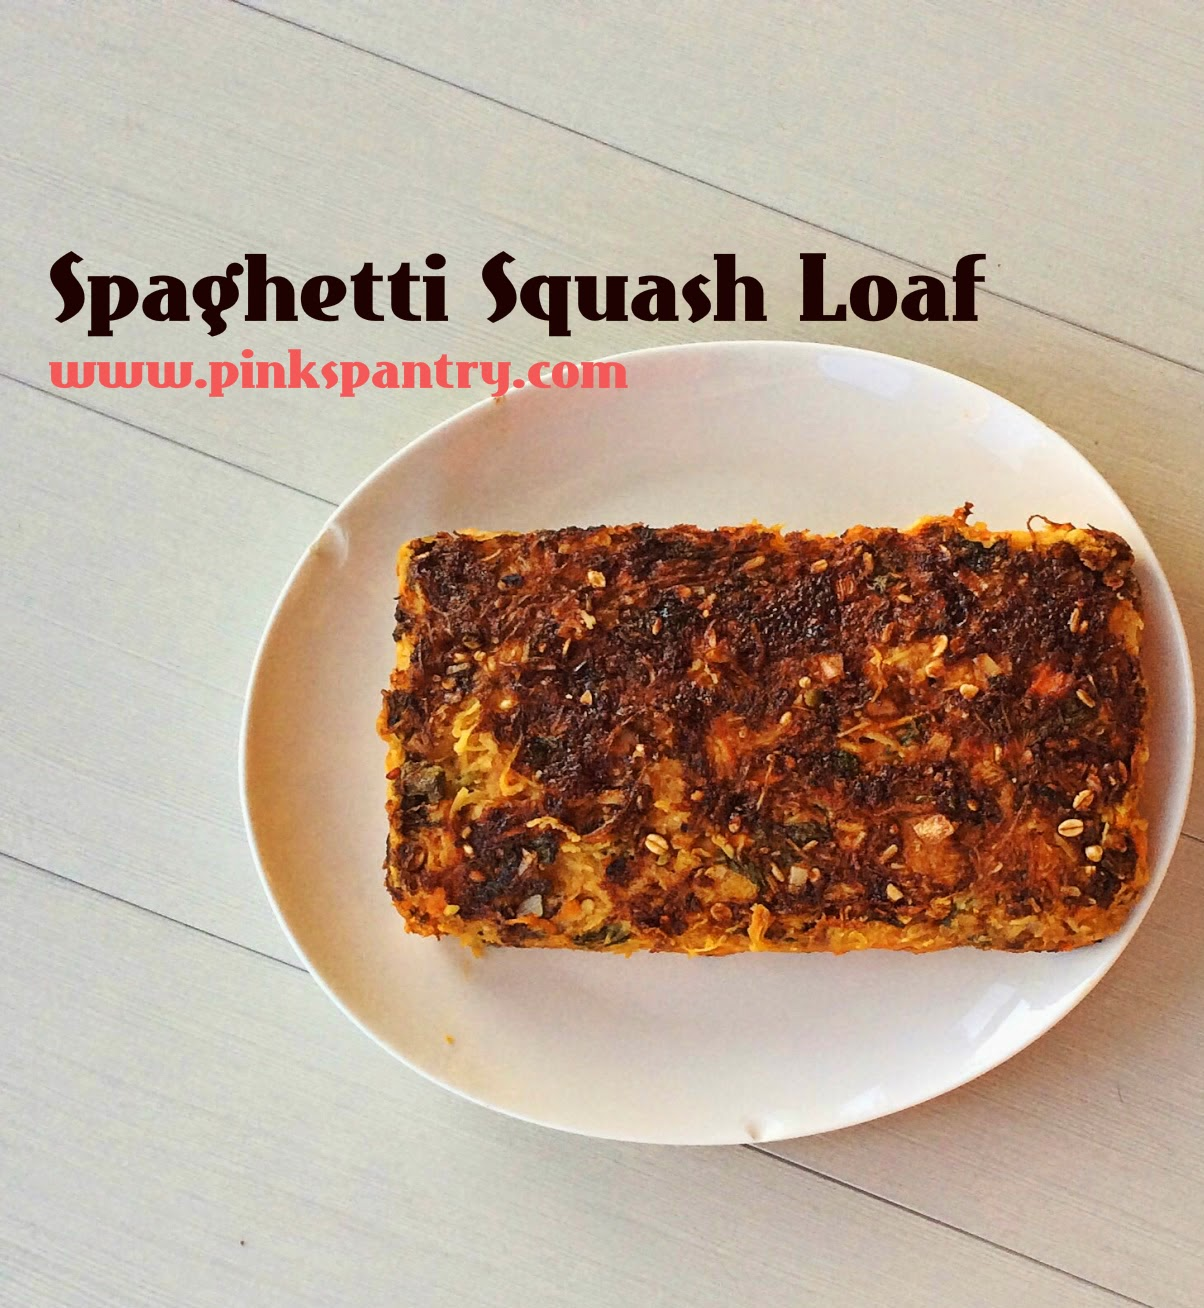 spaghetti squash loaf